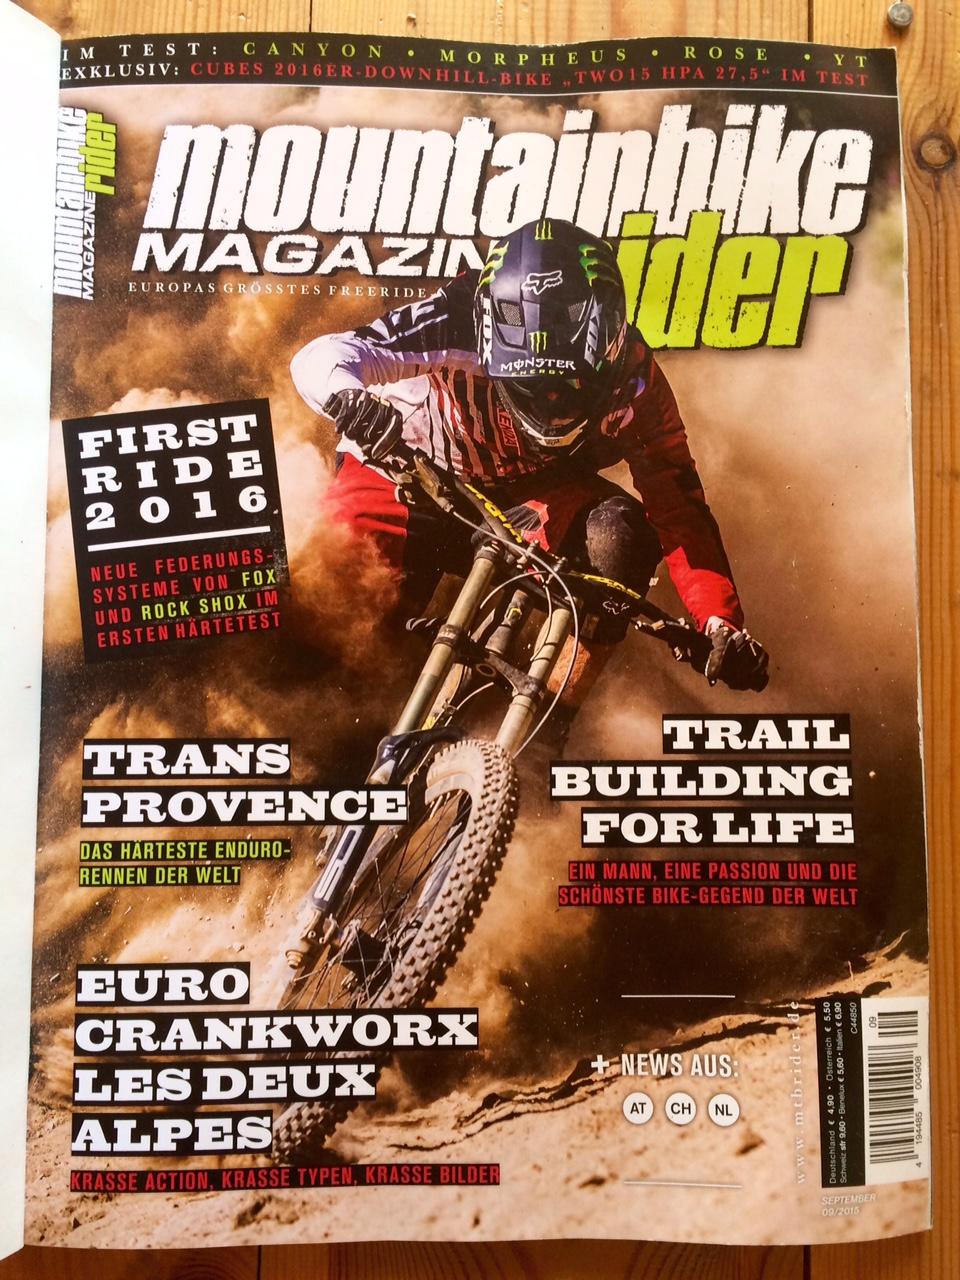 Mountainbike Rider - Germany 2015